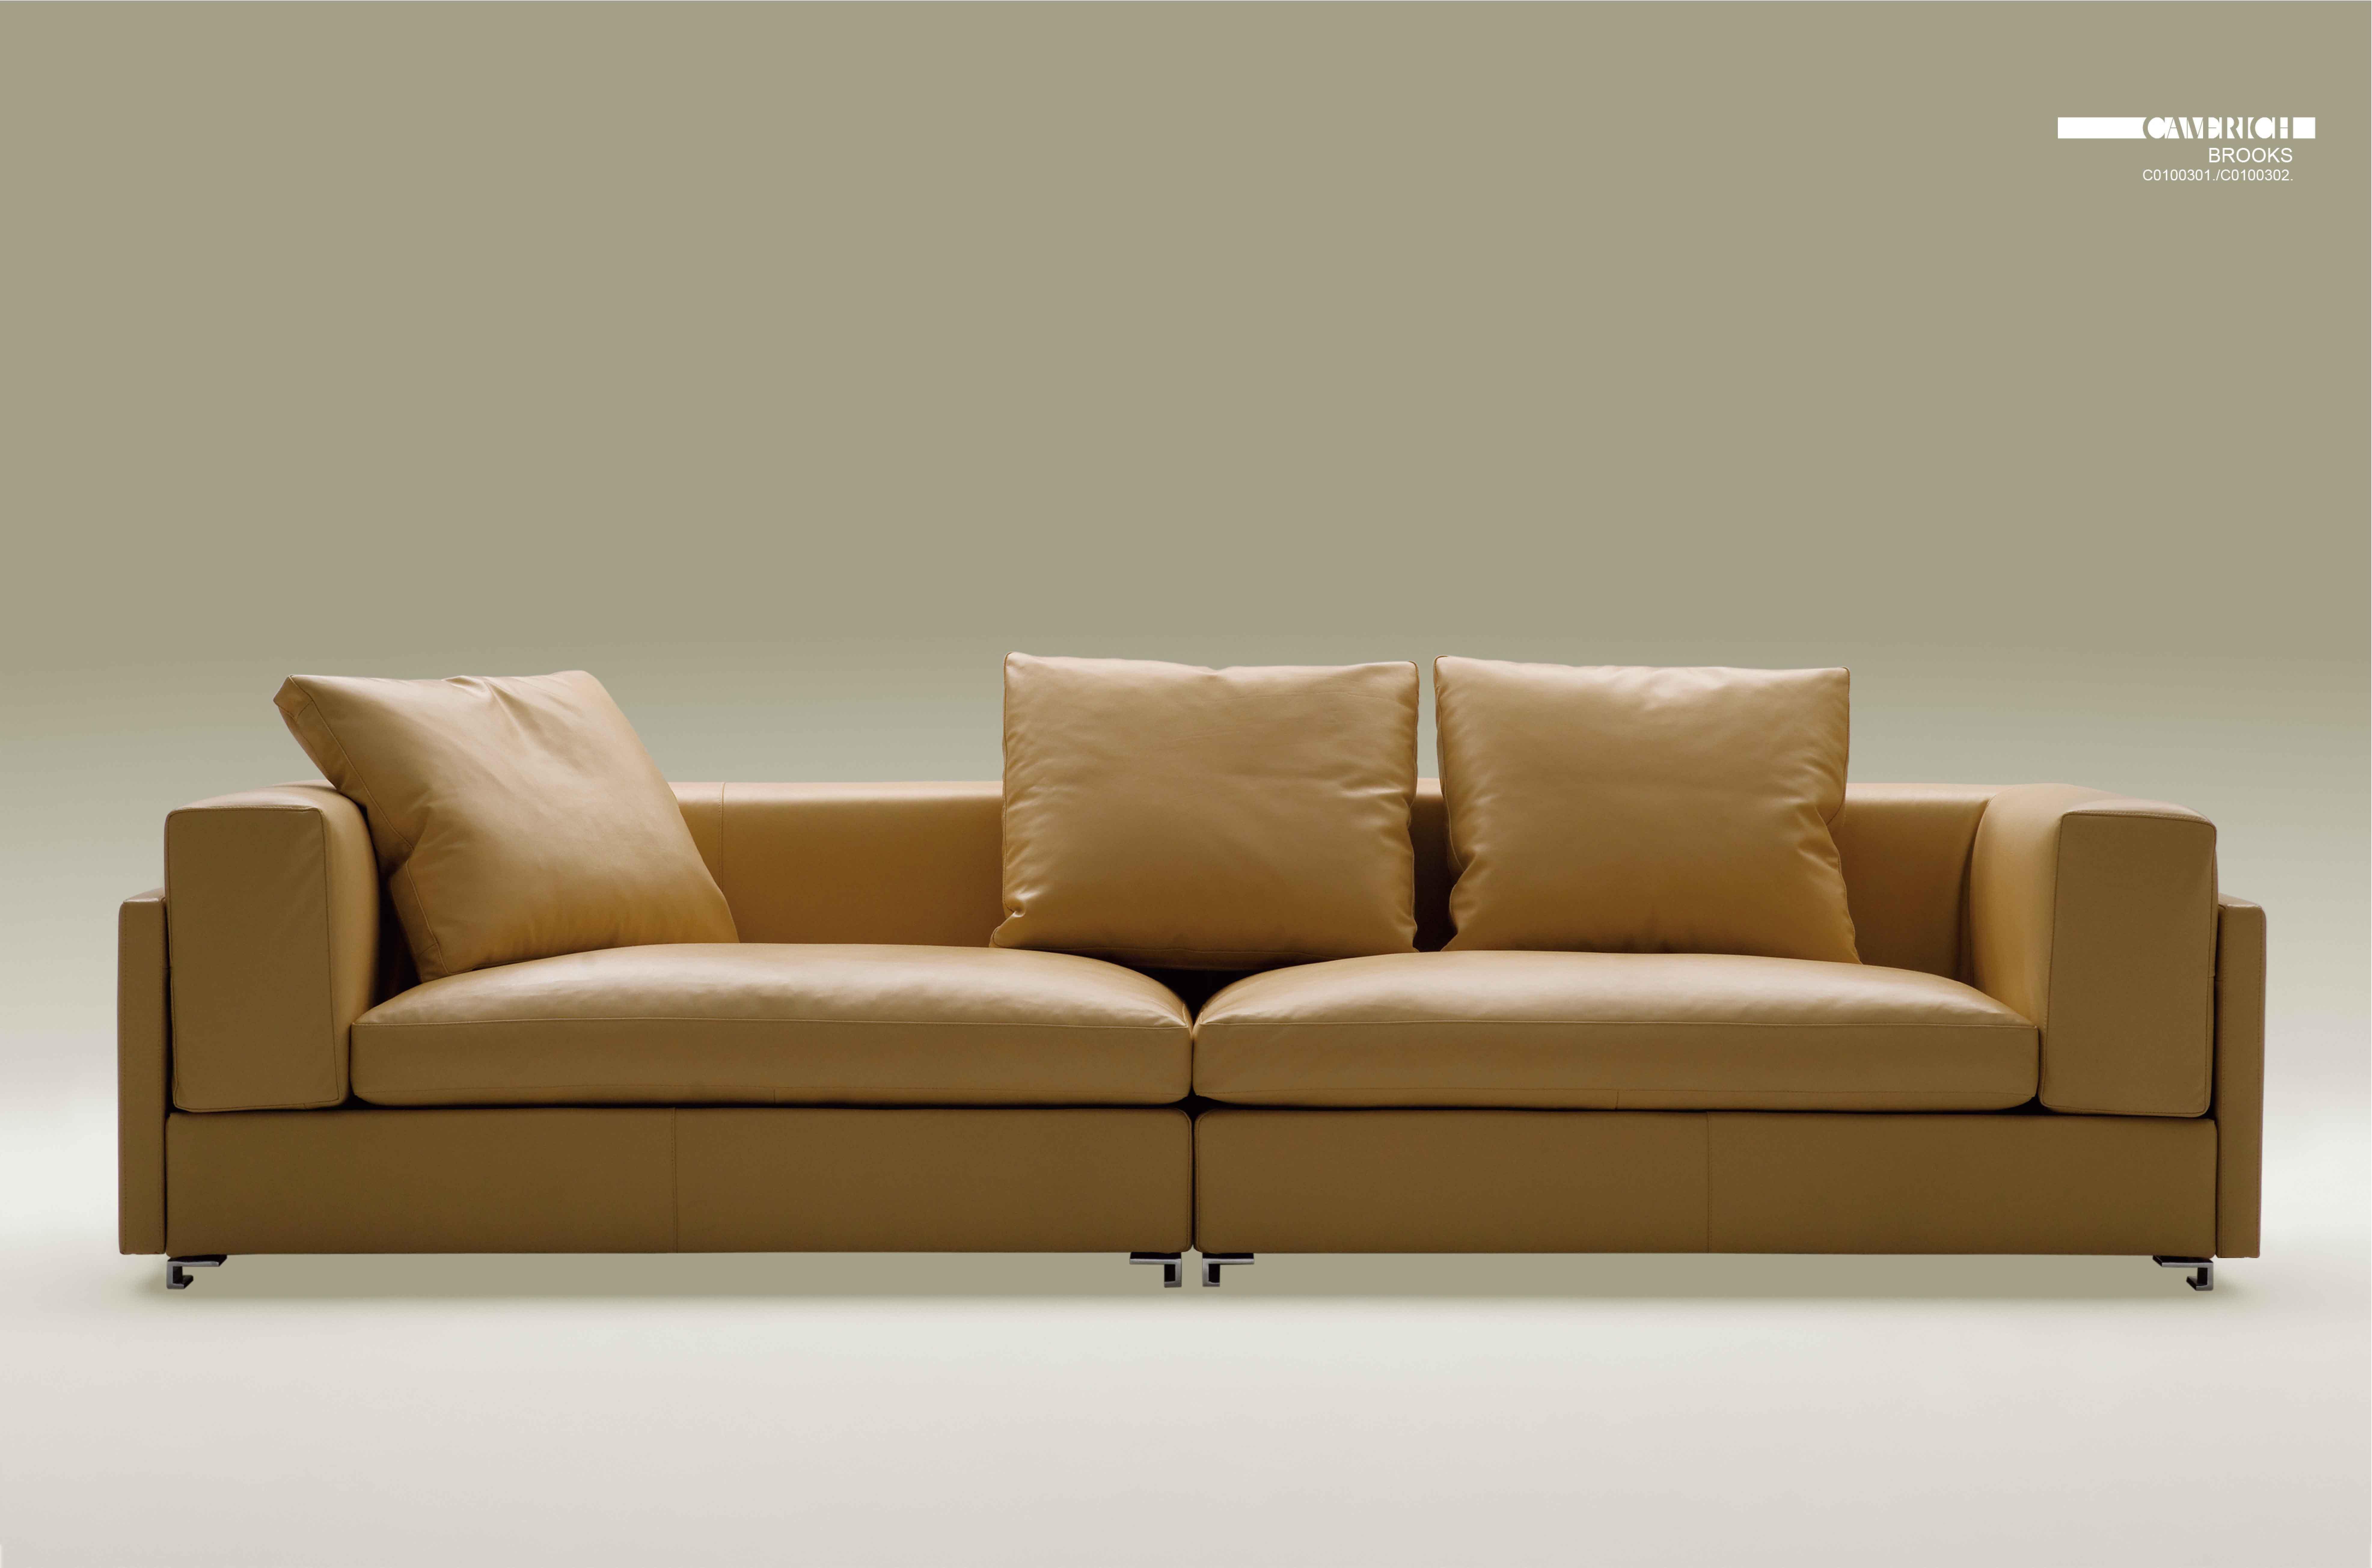 Sofa Chair Images Kivik On Pinterest Ikea